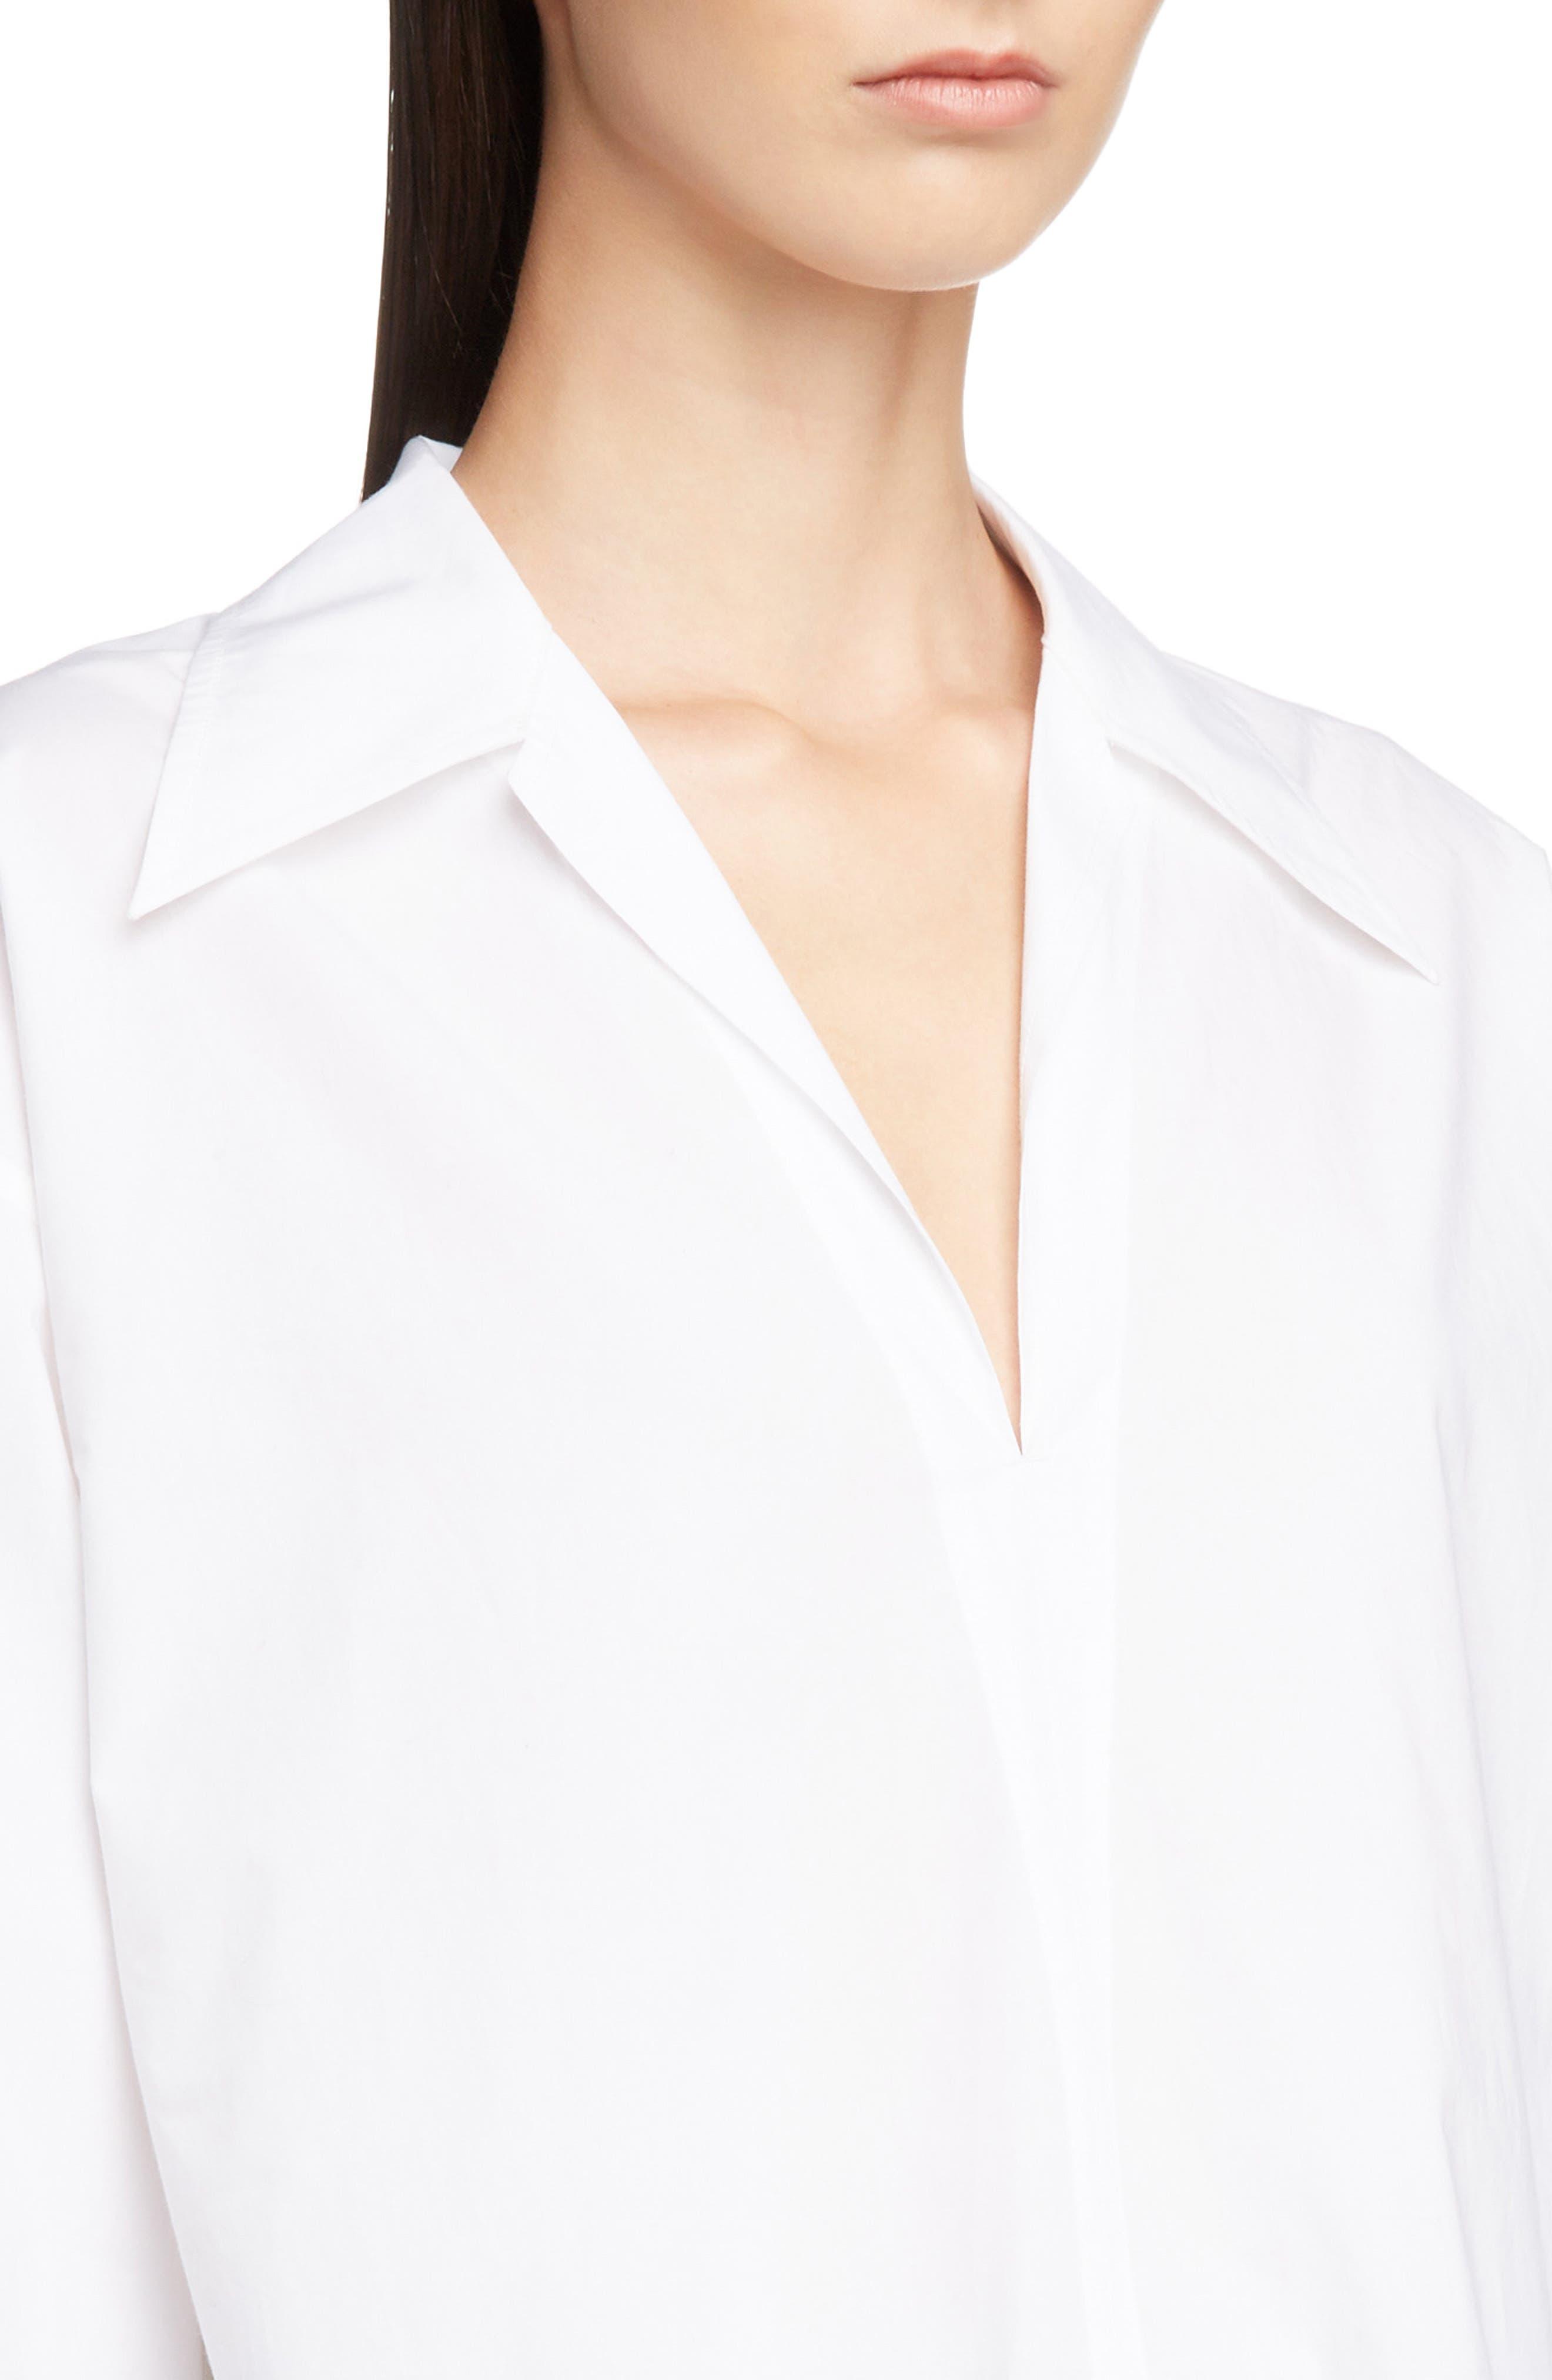 ACNE STUDIOS,                             Spread Collar Shirt,                             Alternate thumbnail 4, color,                             WHITE